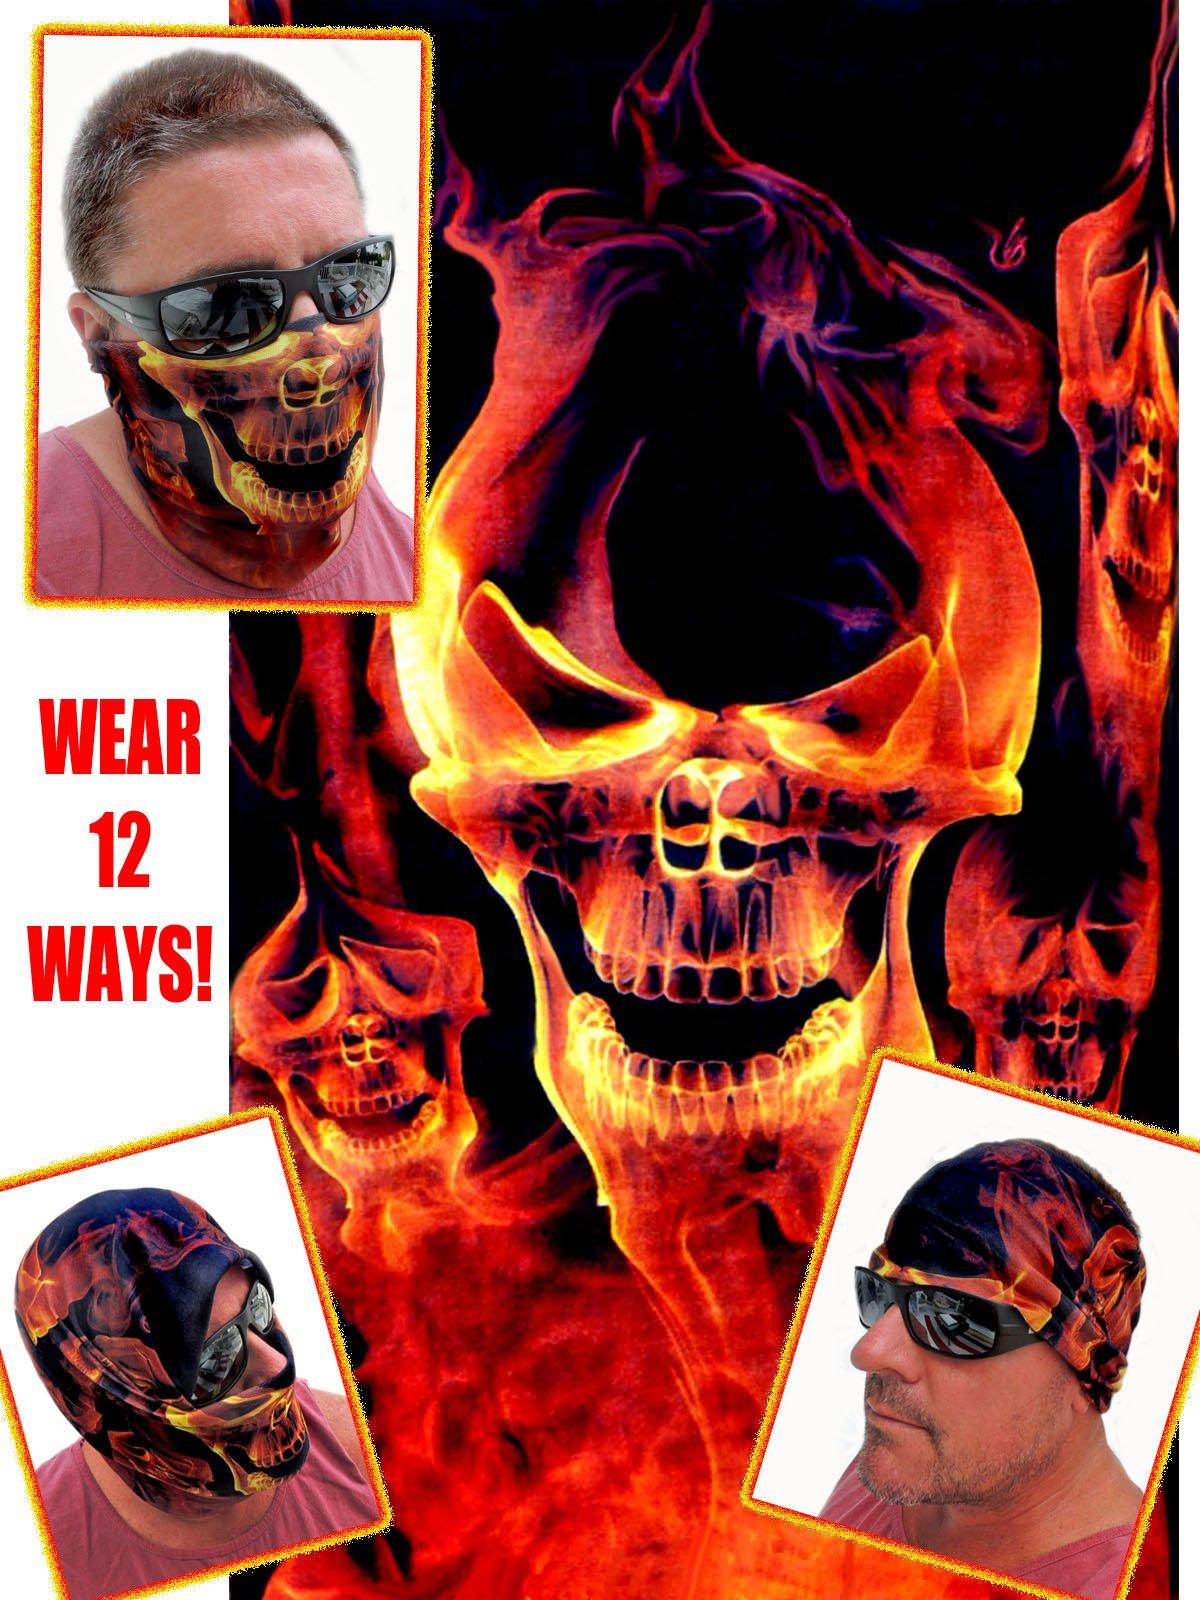 12-in-1 Headband - RED Skull Flame - Versatile Sports & Casual Headwear - Wear as a Bandana, Neck Gaiter, Balaclava, Helmet Liner, Mask - High Performance Microfiber